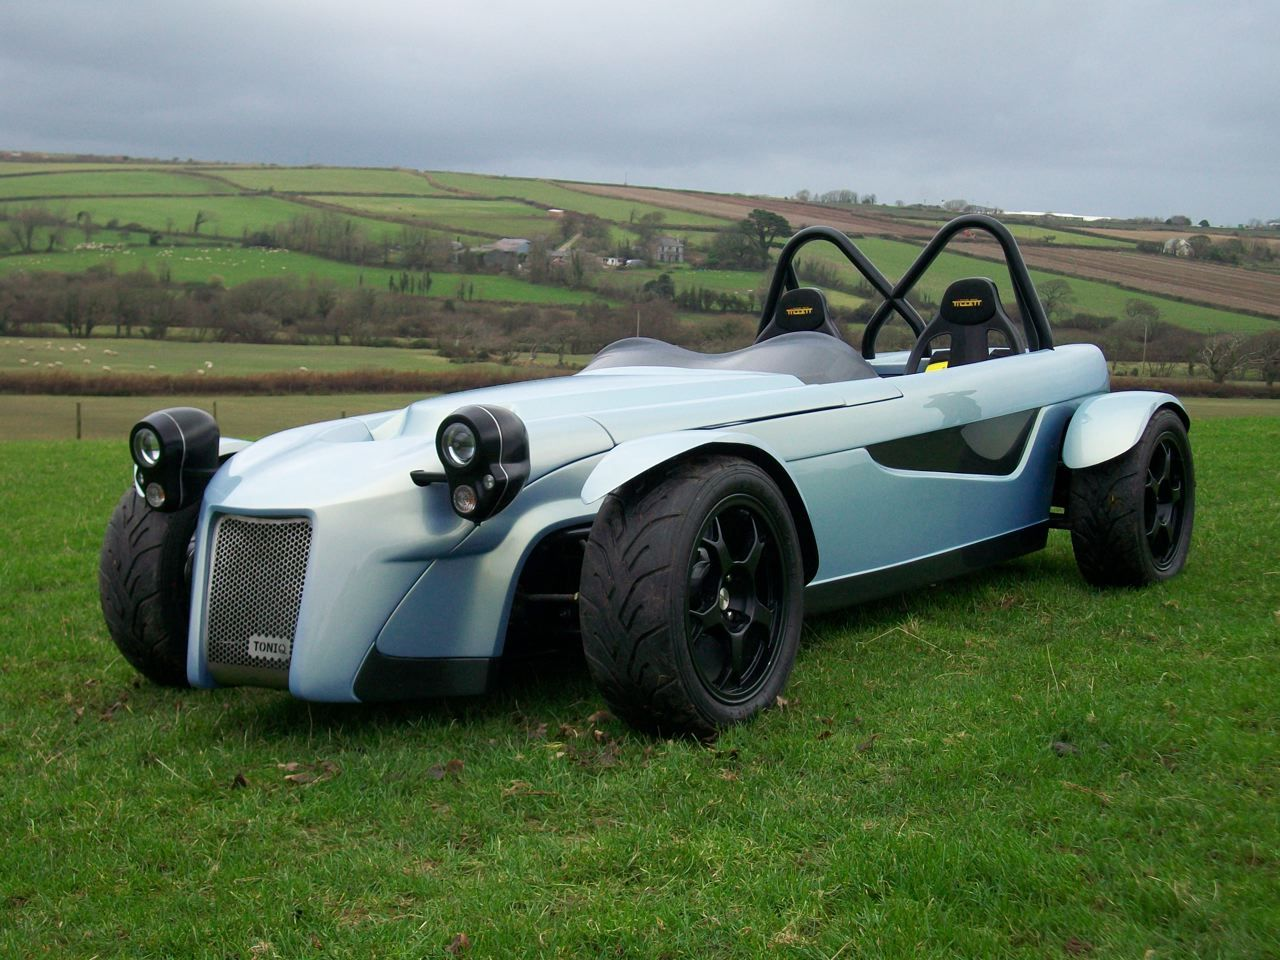 Homebuiltkitcars Both Car Guys That Wanted To Make - Sports cars makes